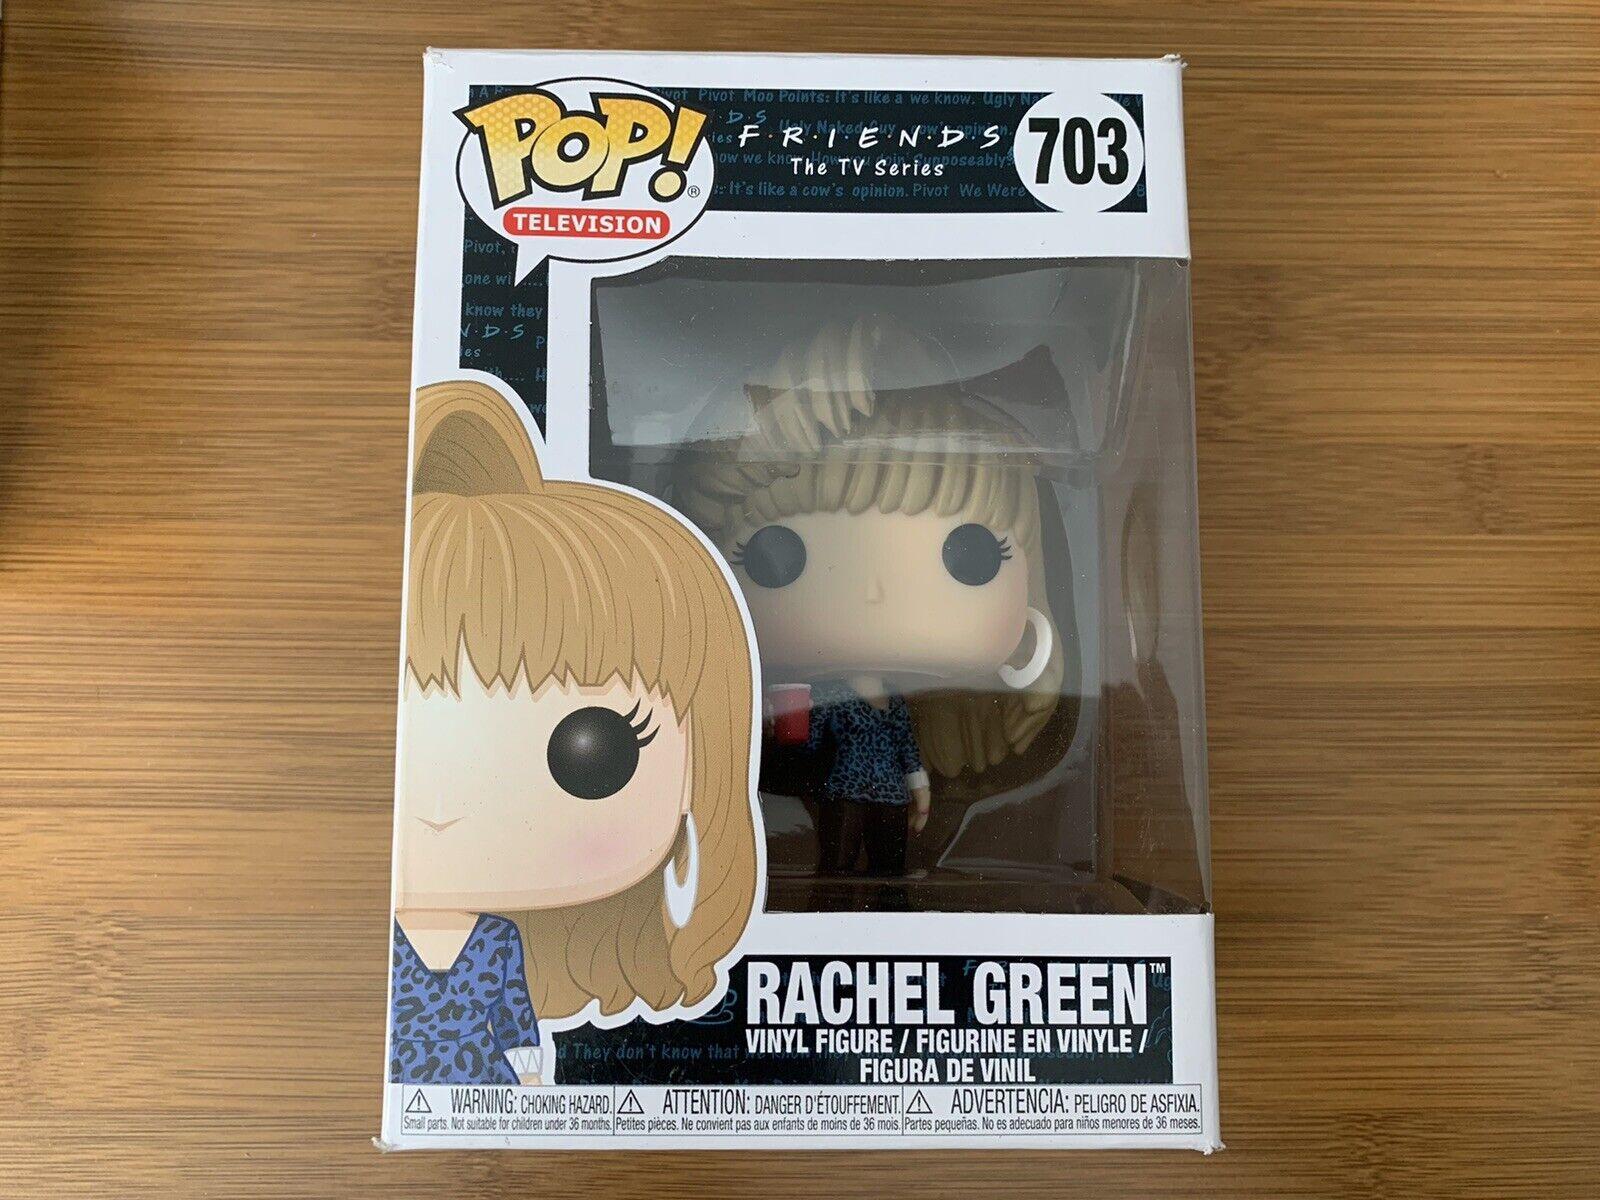 Funko Pop! Friends #703 Rachel Green Vinyl Figure - Damaged Box